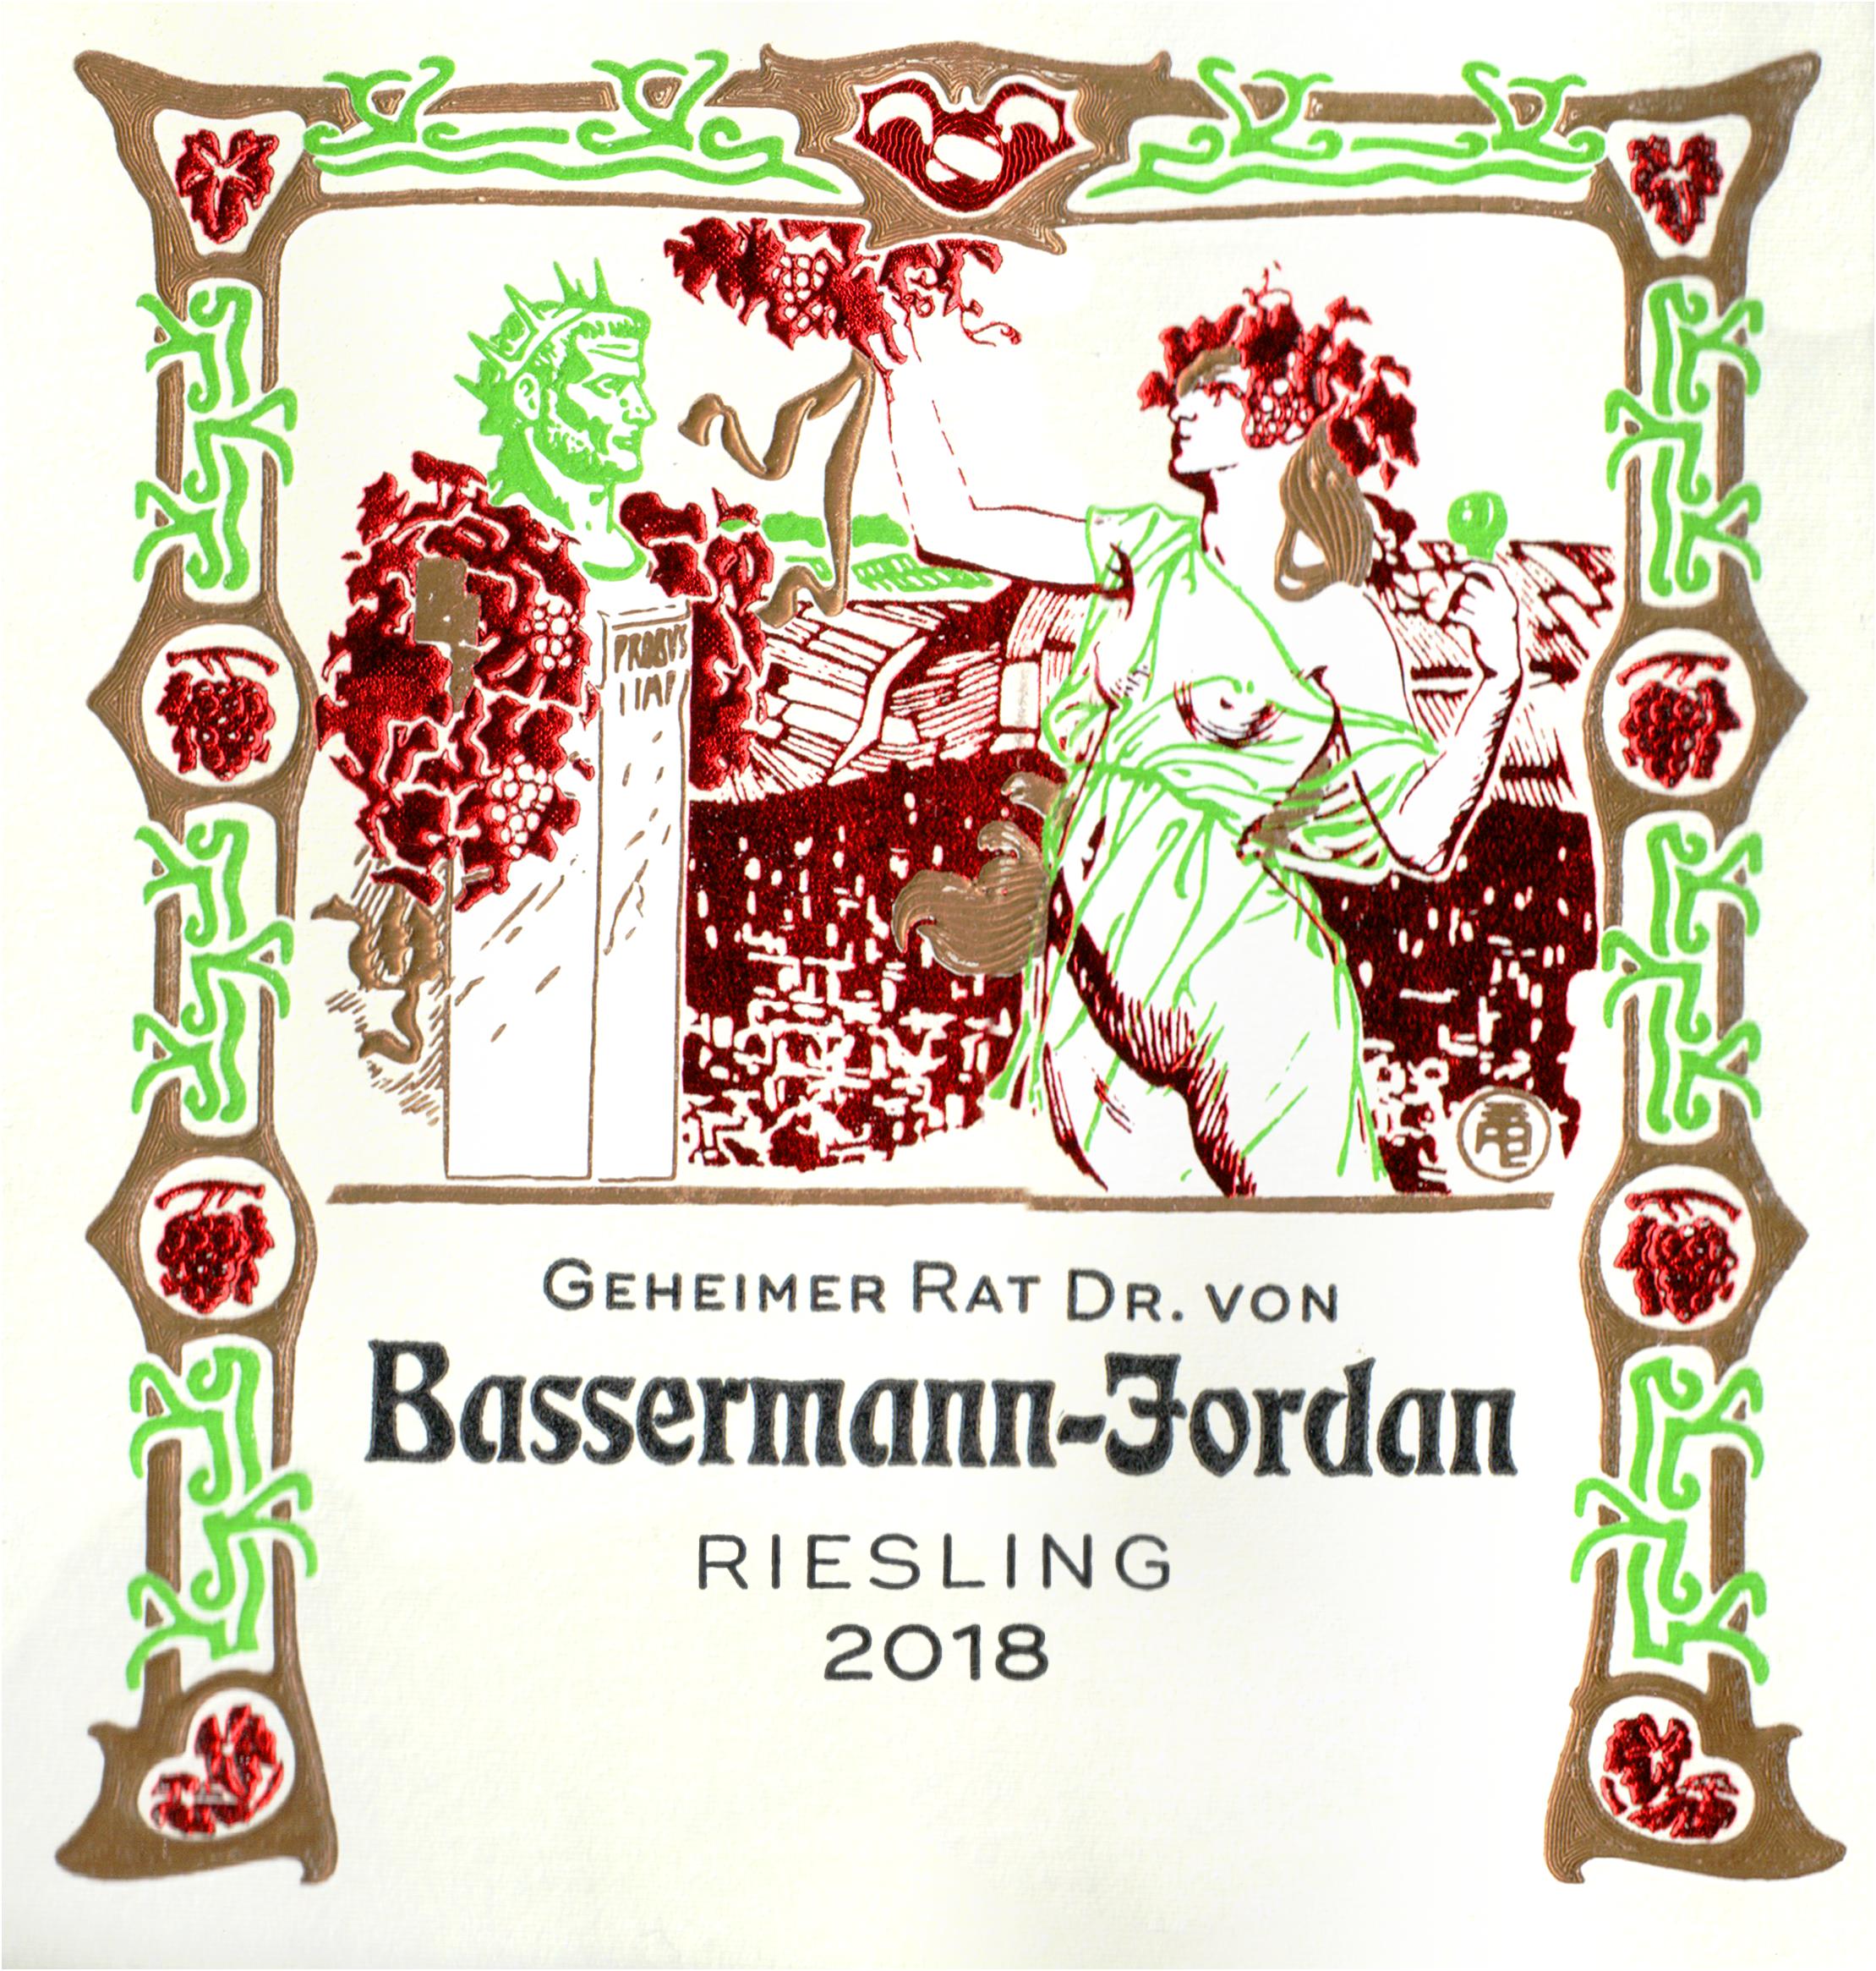 Basserman Jordan Riesling 2018